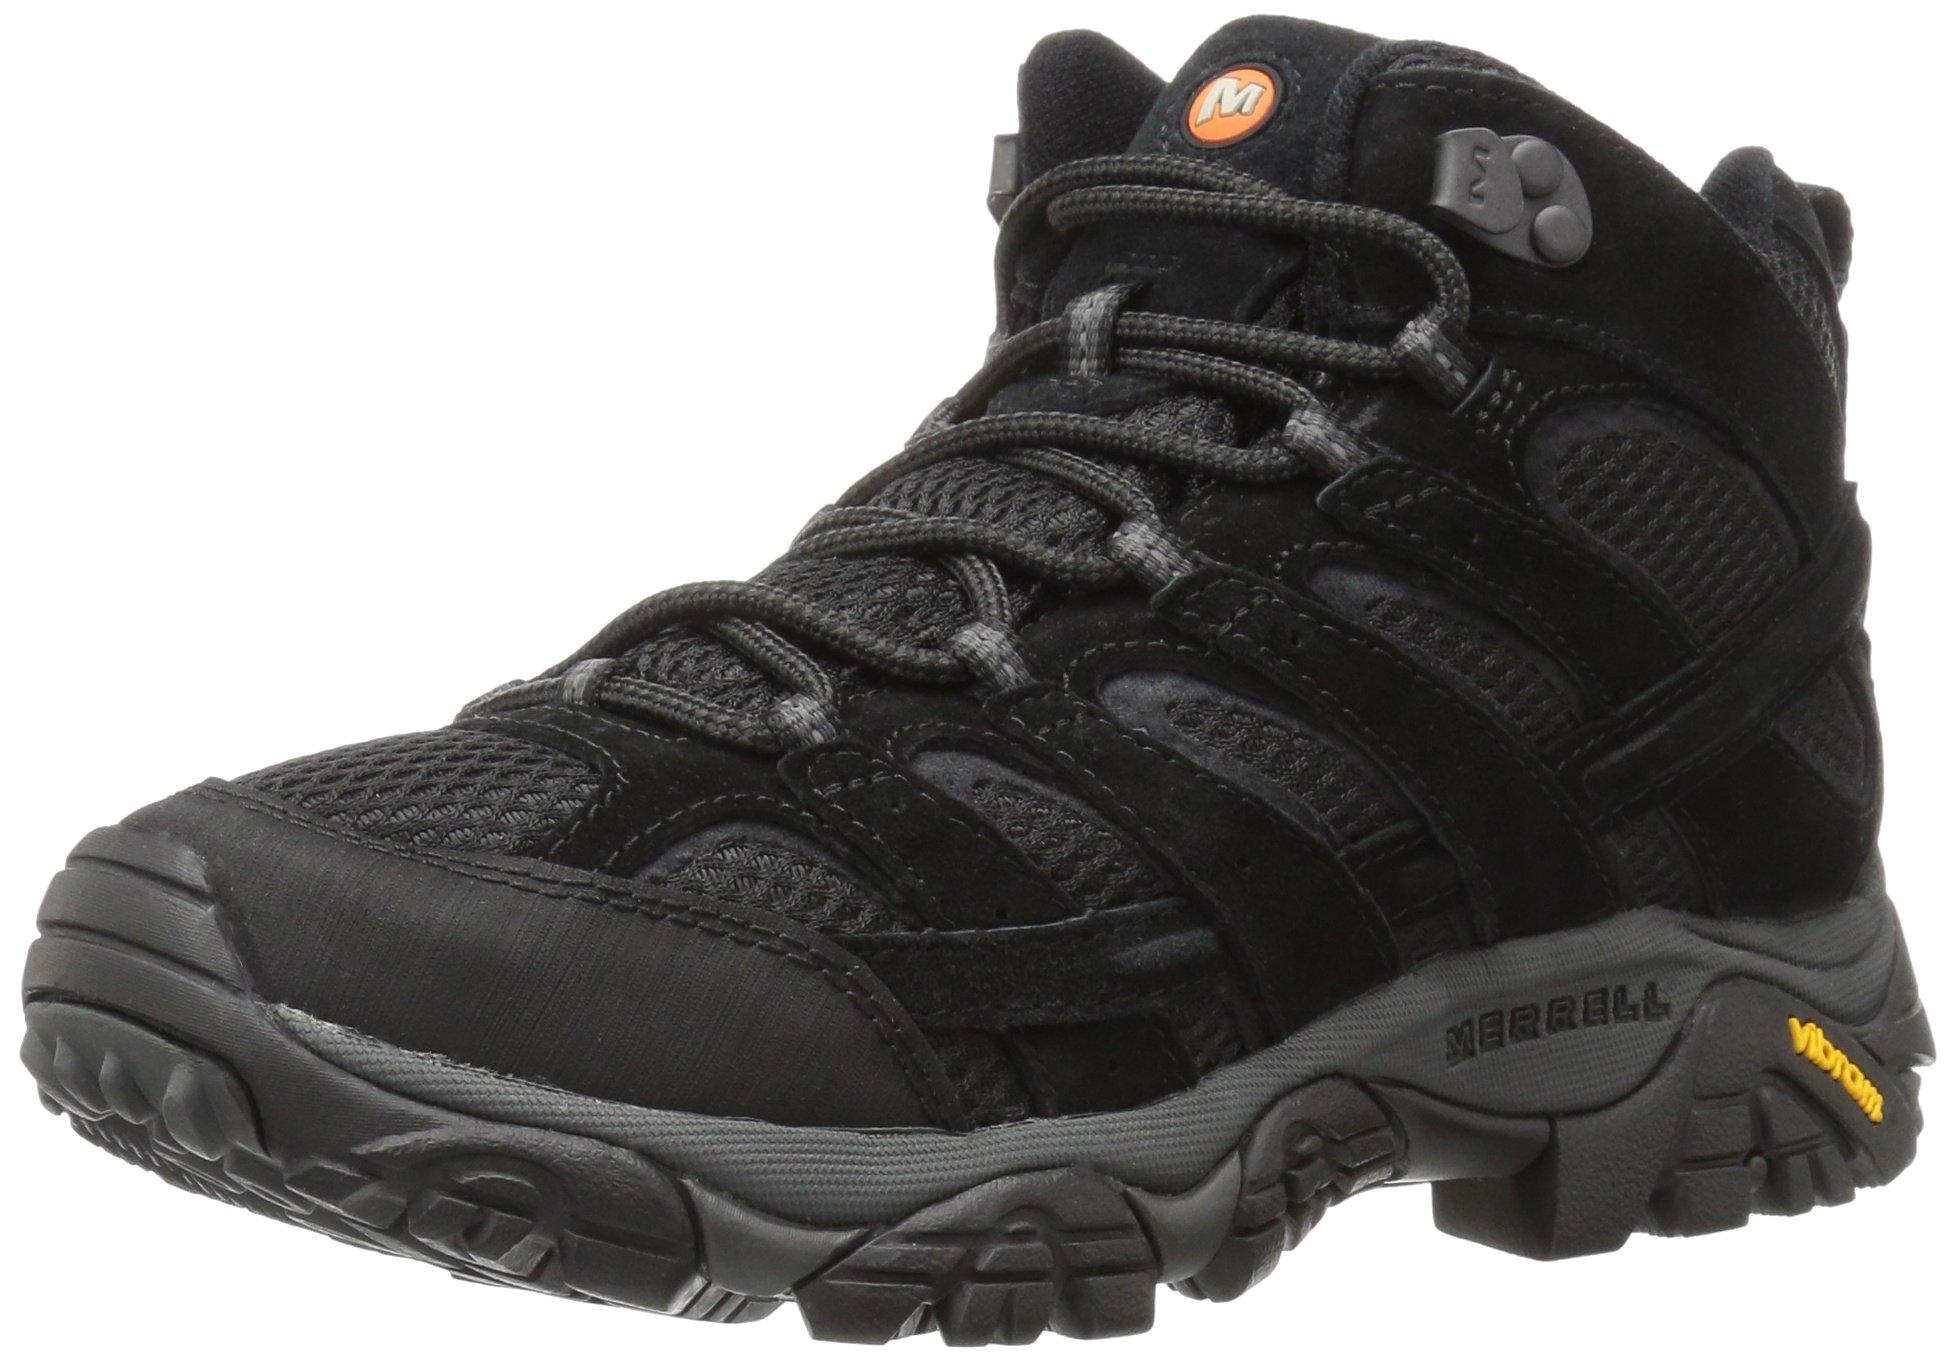 Merrell Men's Moab 2 Vent Mid Hiking Boot, Black Night, 8 M US